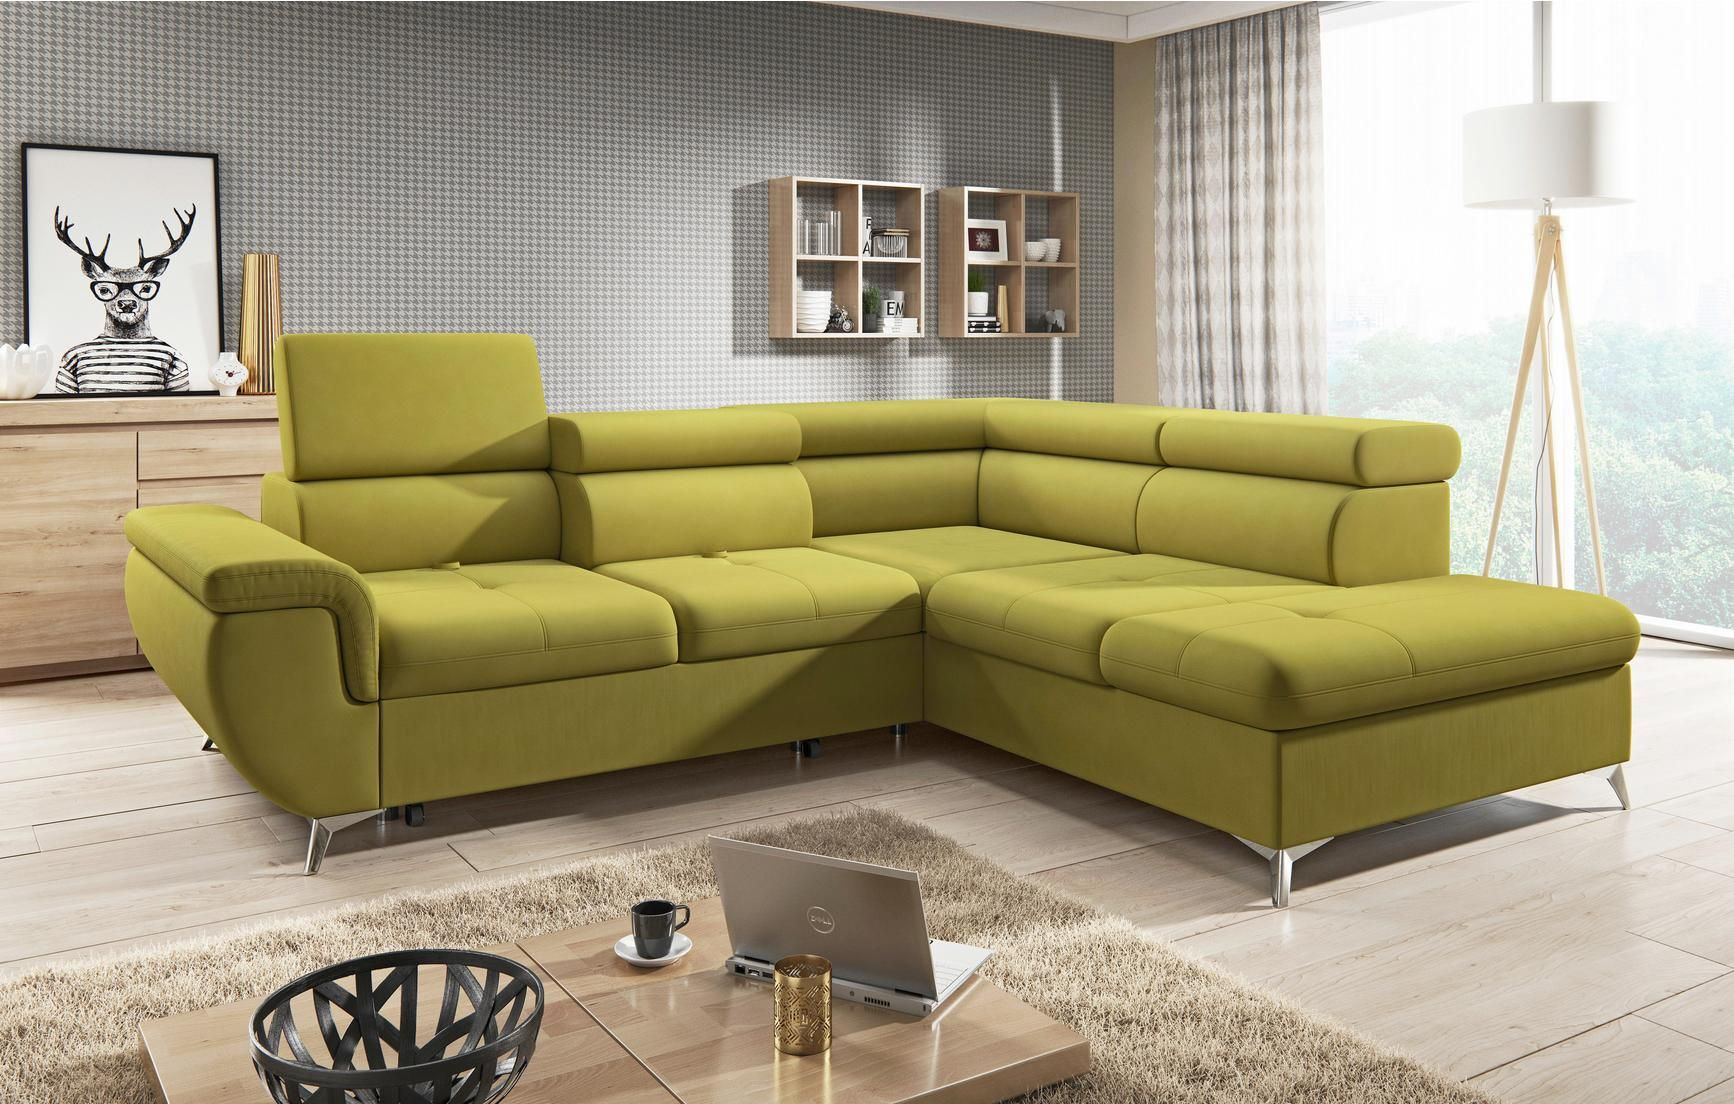 Wohnlandschaft In Gelb Mit Bettfunktion In 2019 Living Room